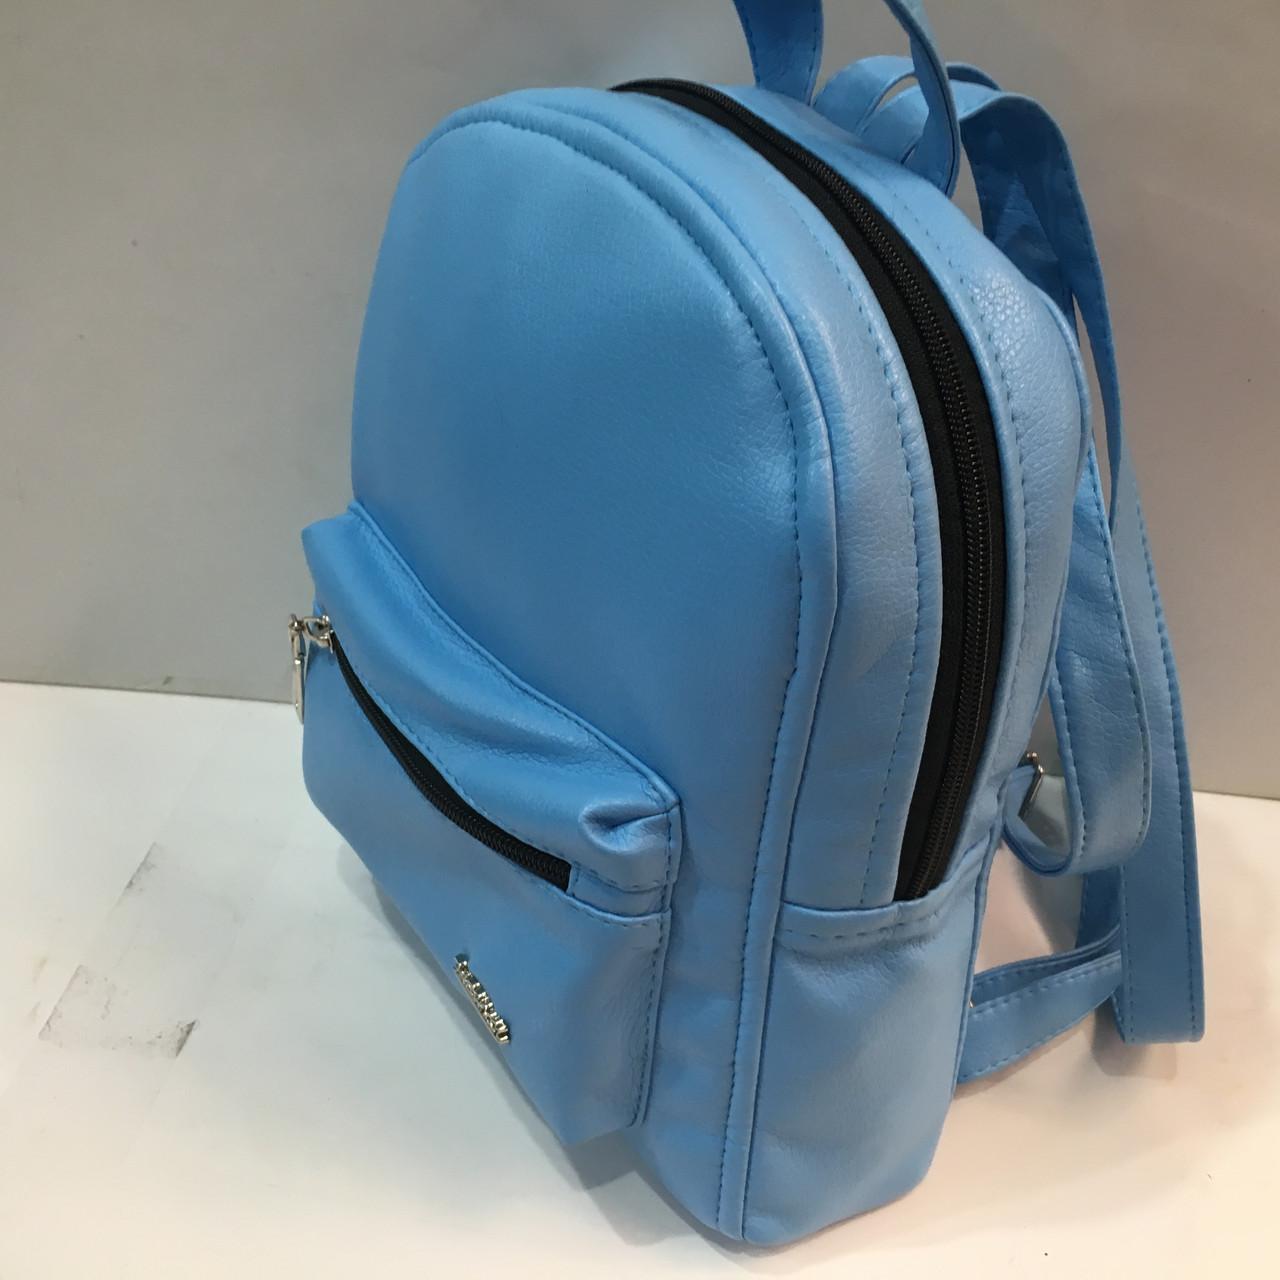 23ecc6aae323 Маленький женский рюкзак из кожзама FASHION оптом: продажа, цена в ...